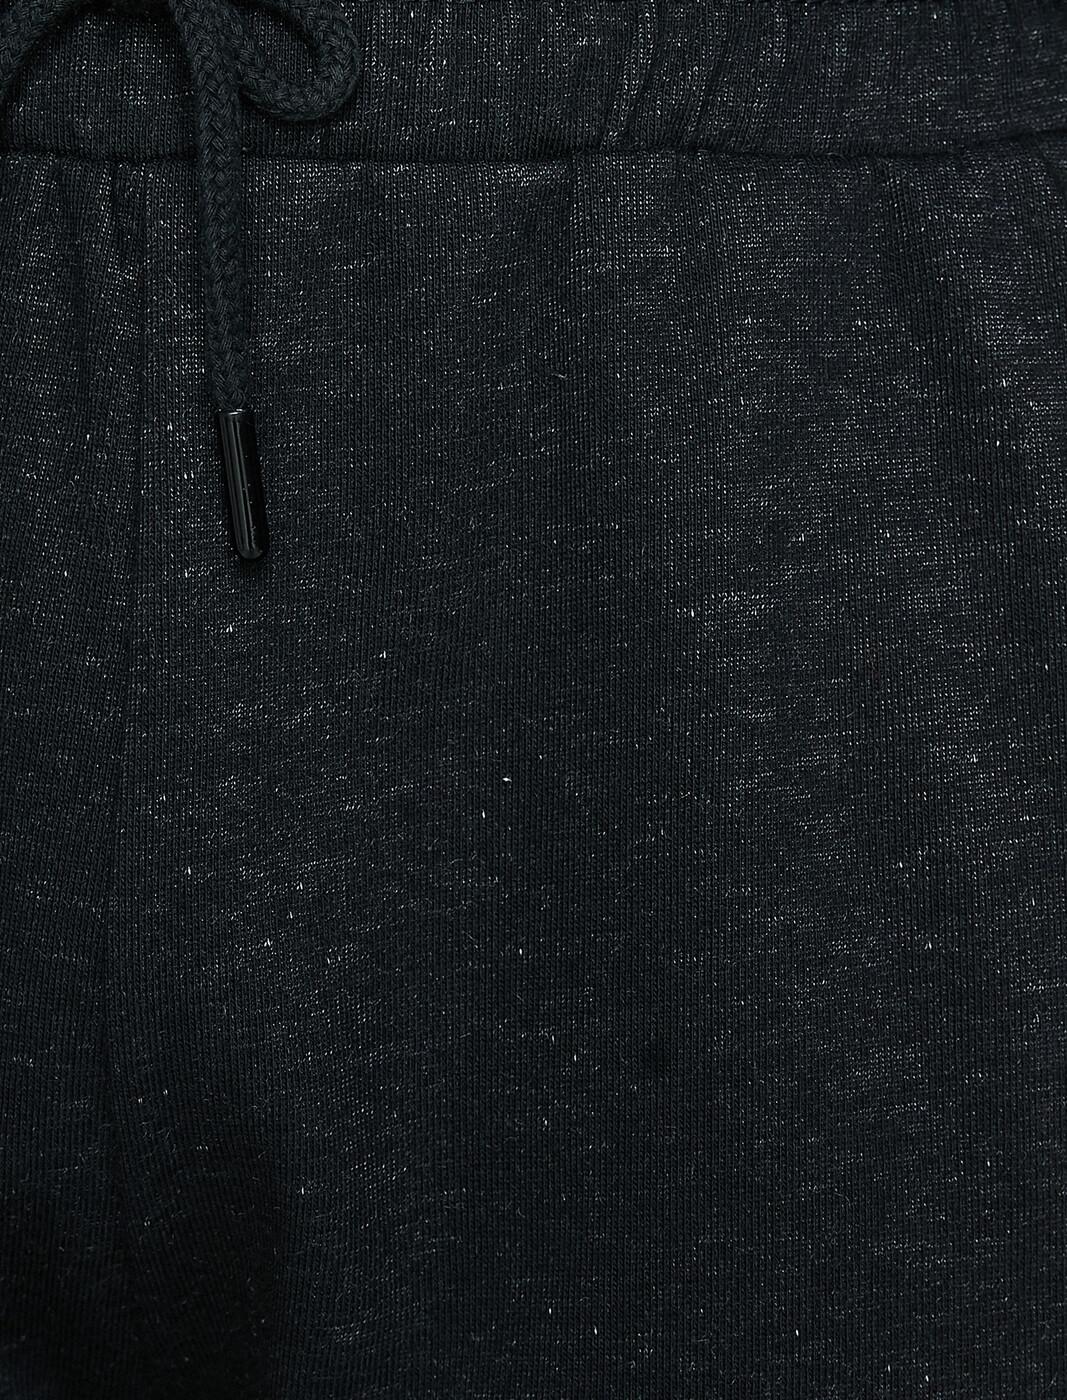 Пудра Maybelline New York Face Studio Setting Powder, матирующая фиксирующая, тон 012, натурально-бежевый, 9 г